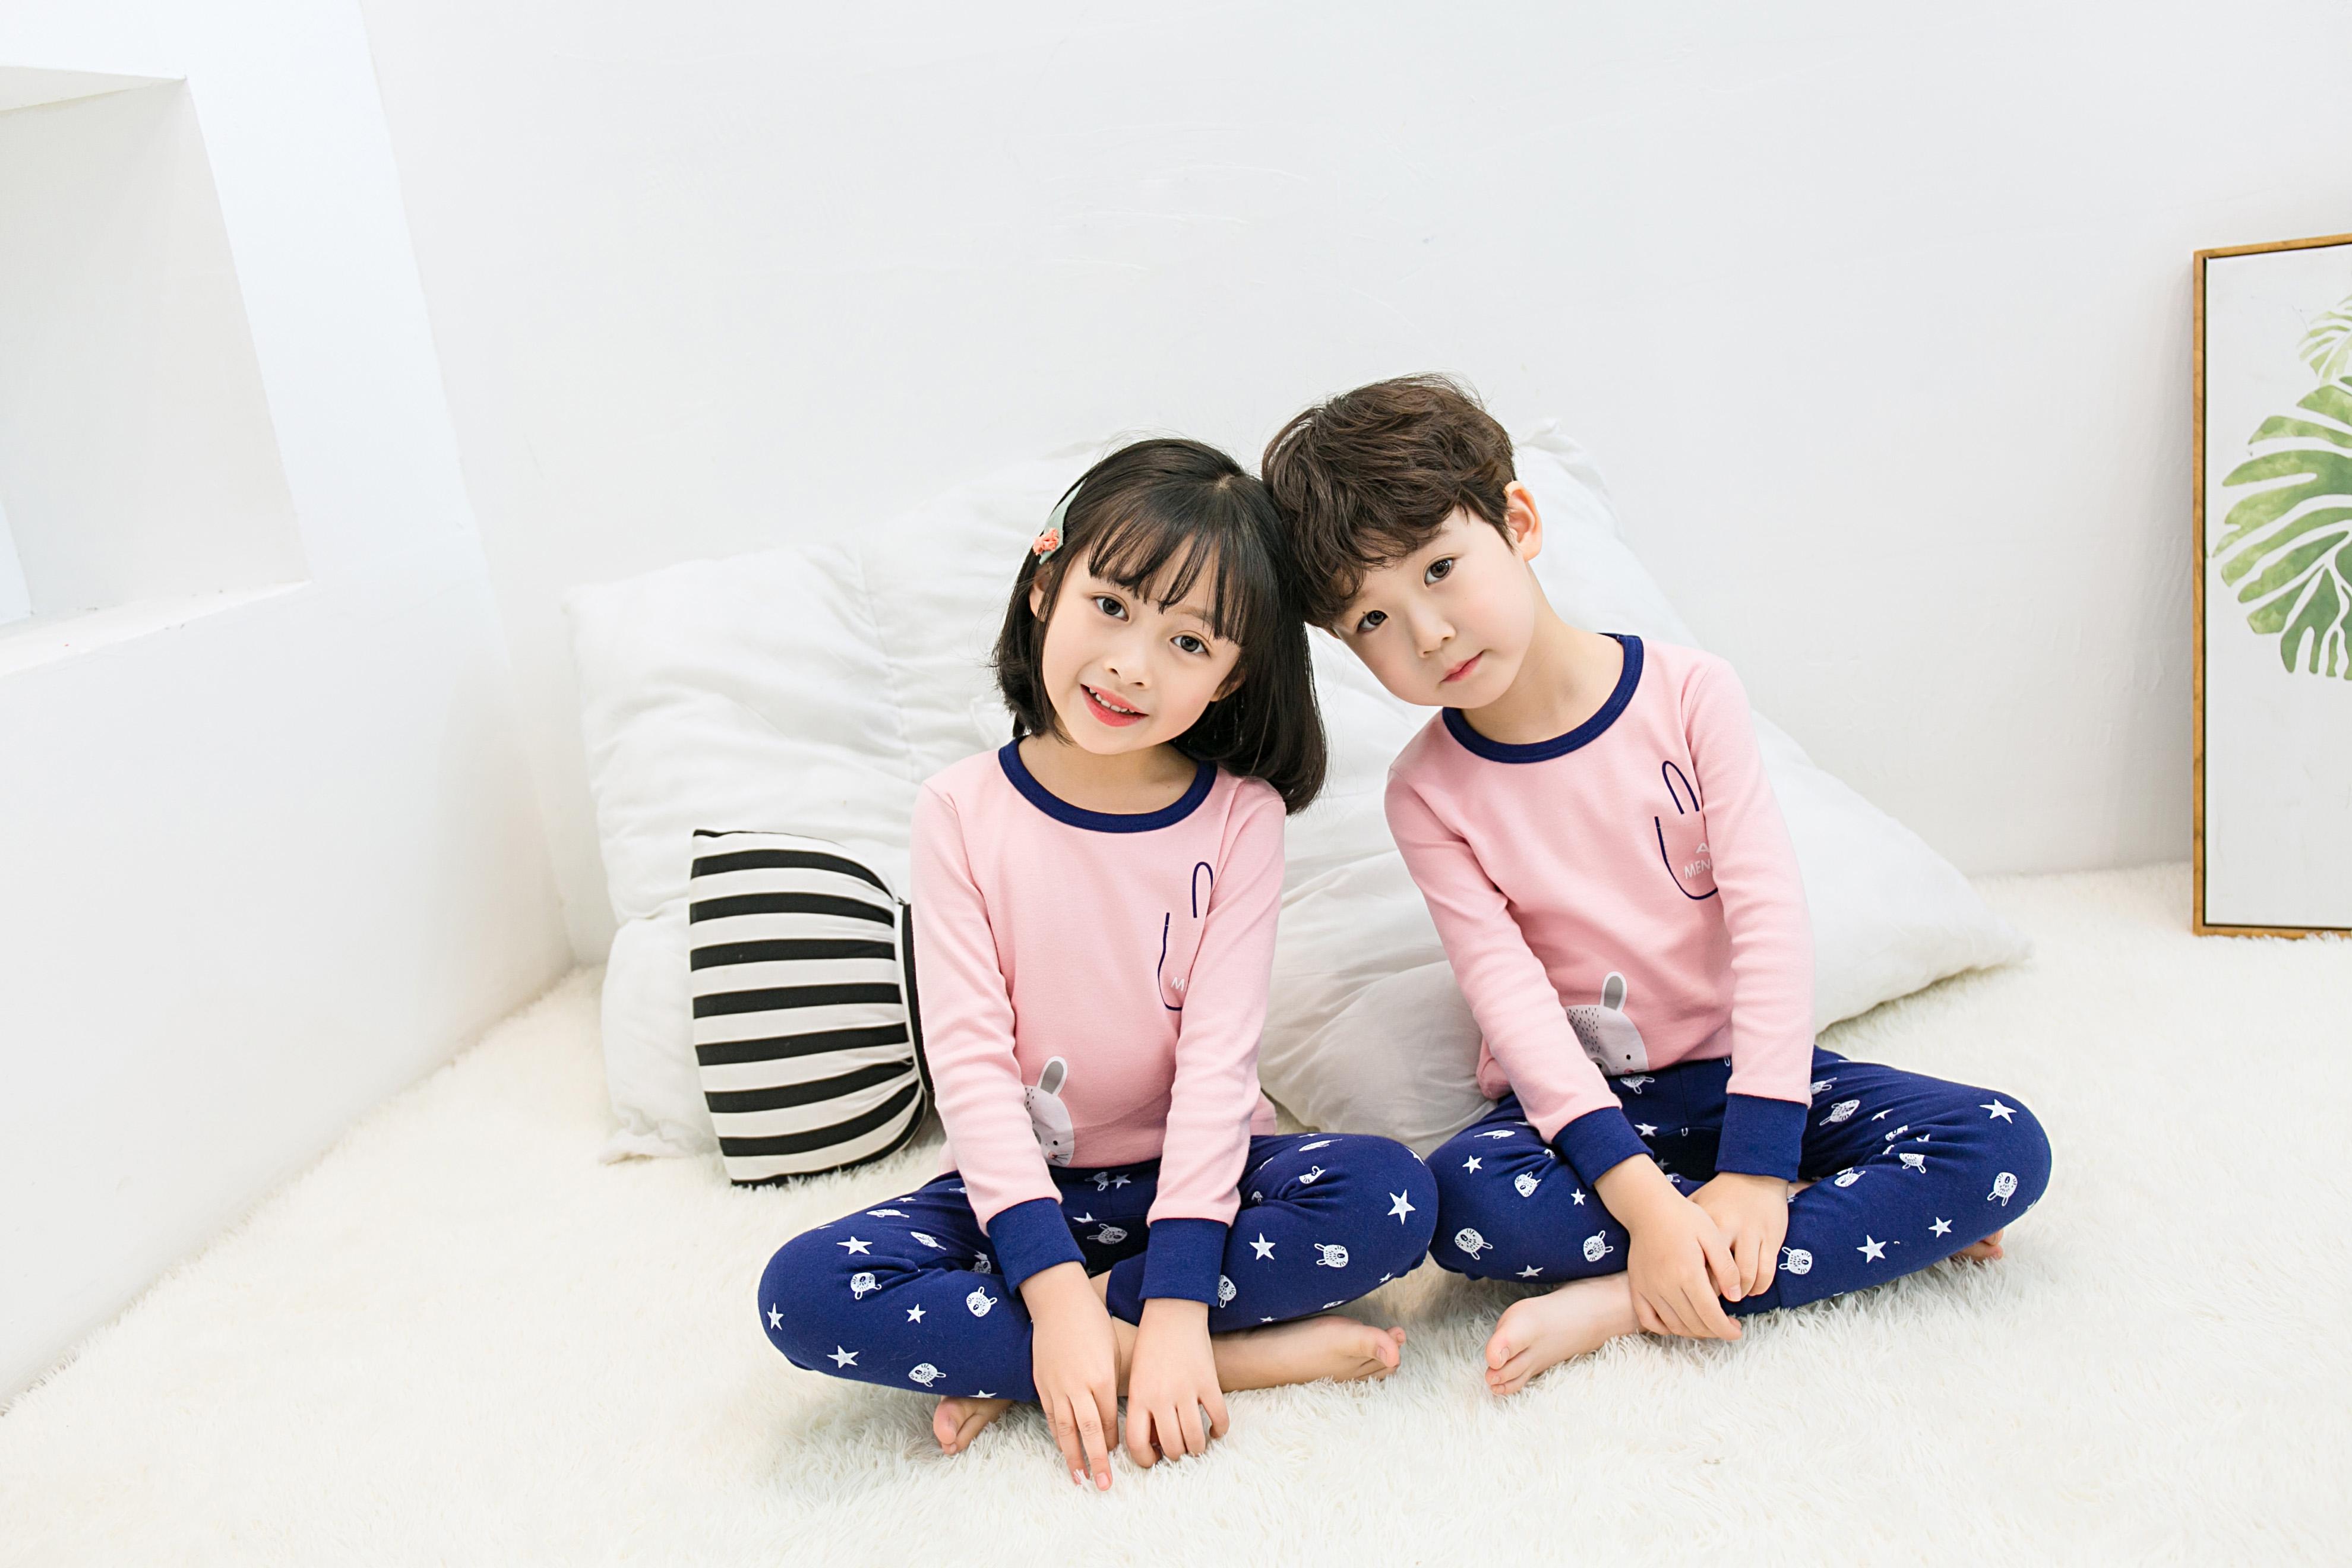 CY 162565 CHILDREN SUIT PASANG BUDAK PYJAMAS AIMEYA PINK 100-160